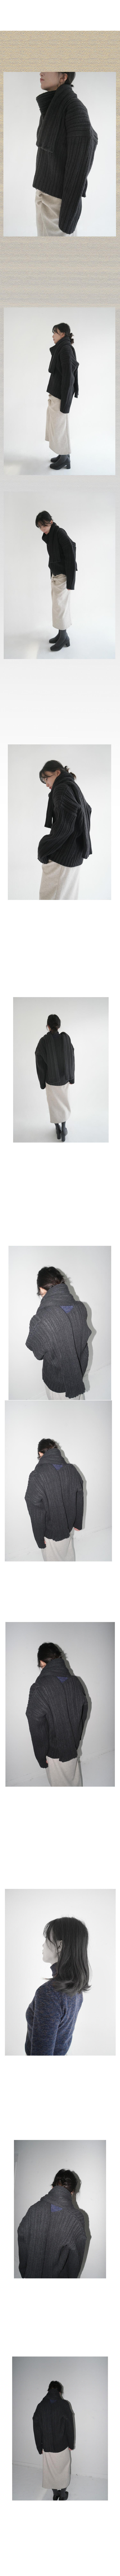 muffler bold knit top